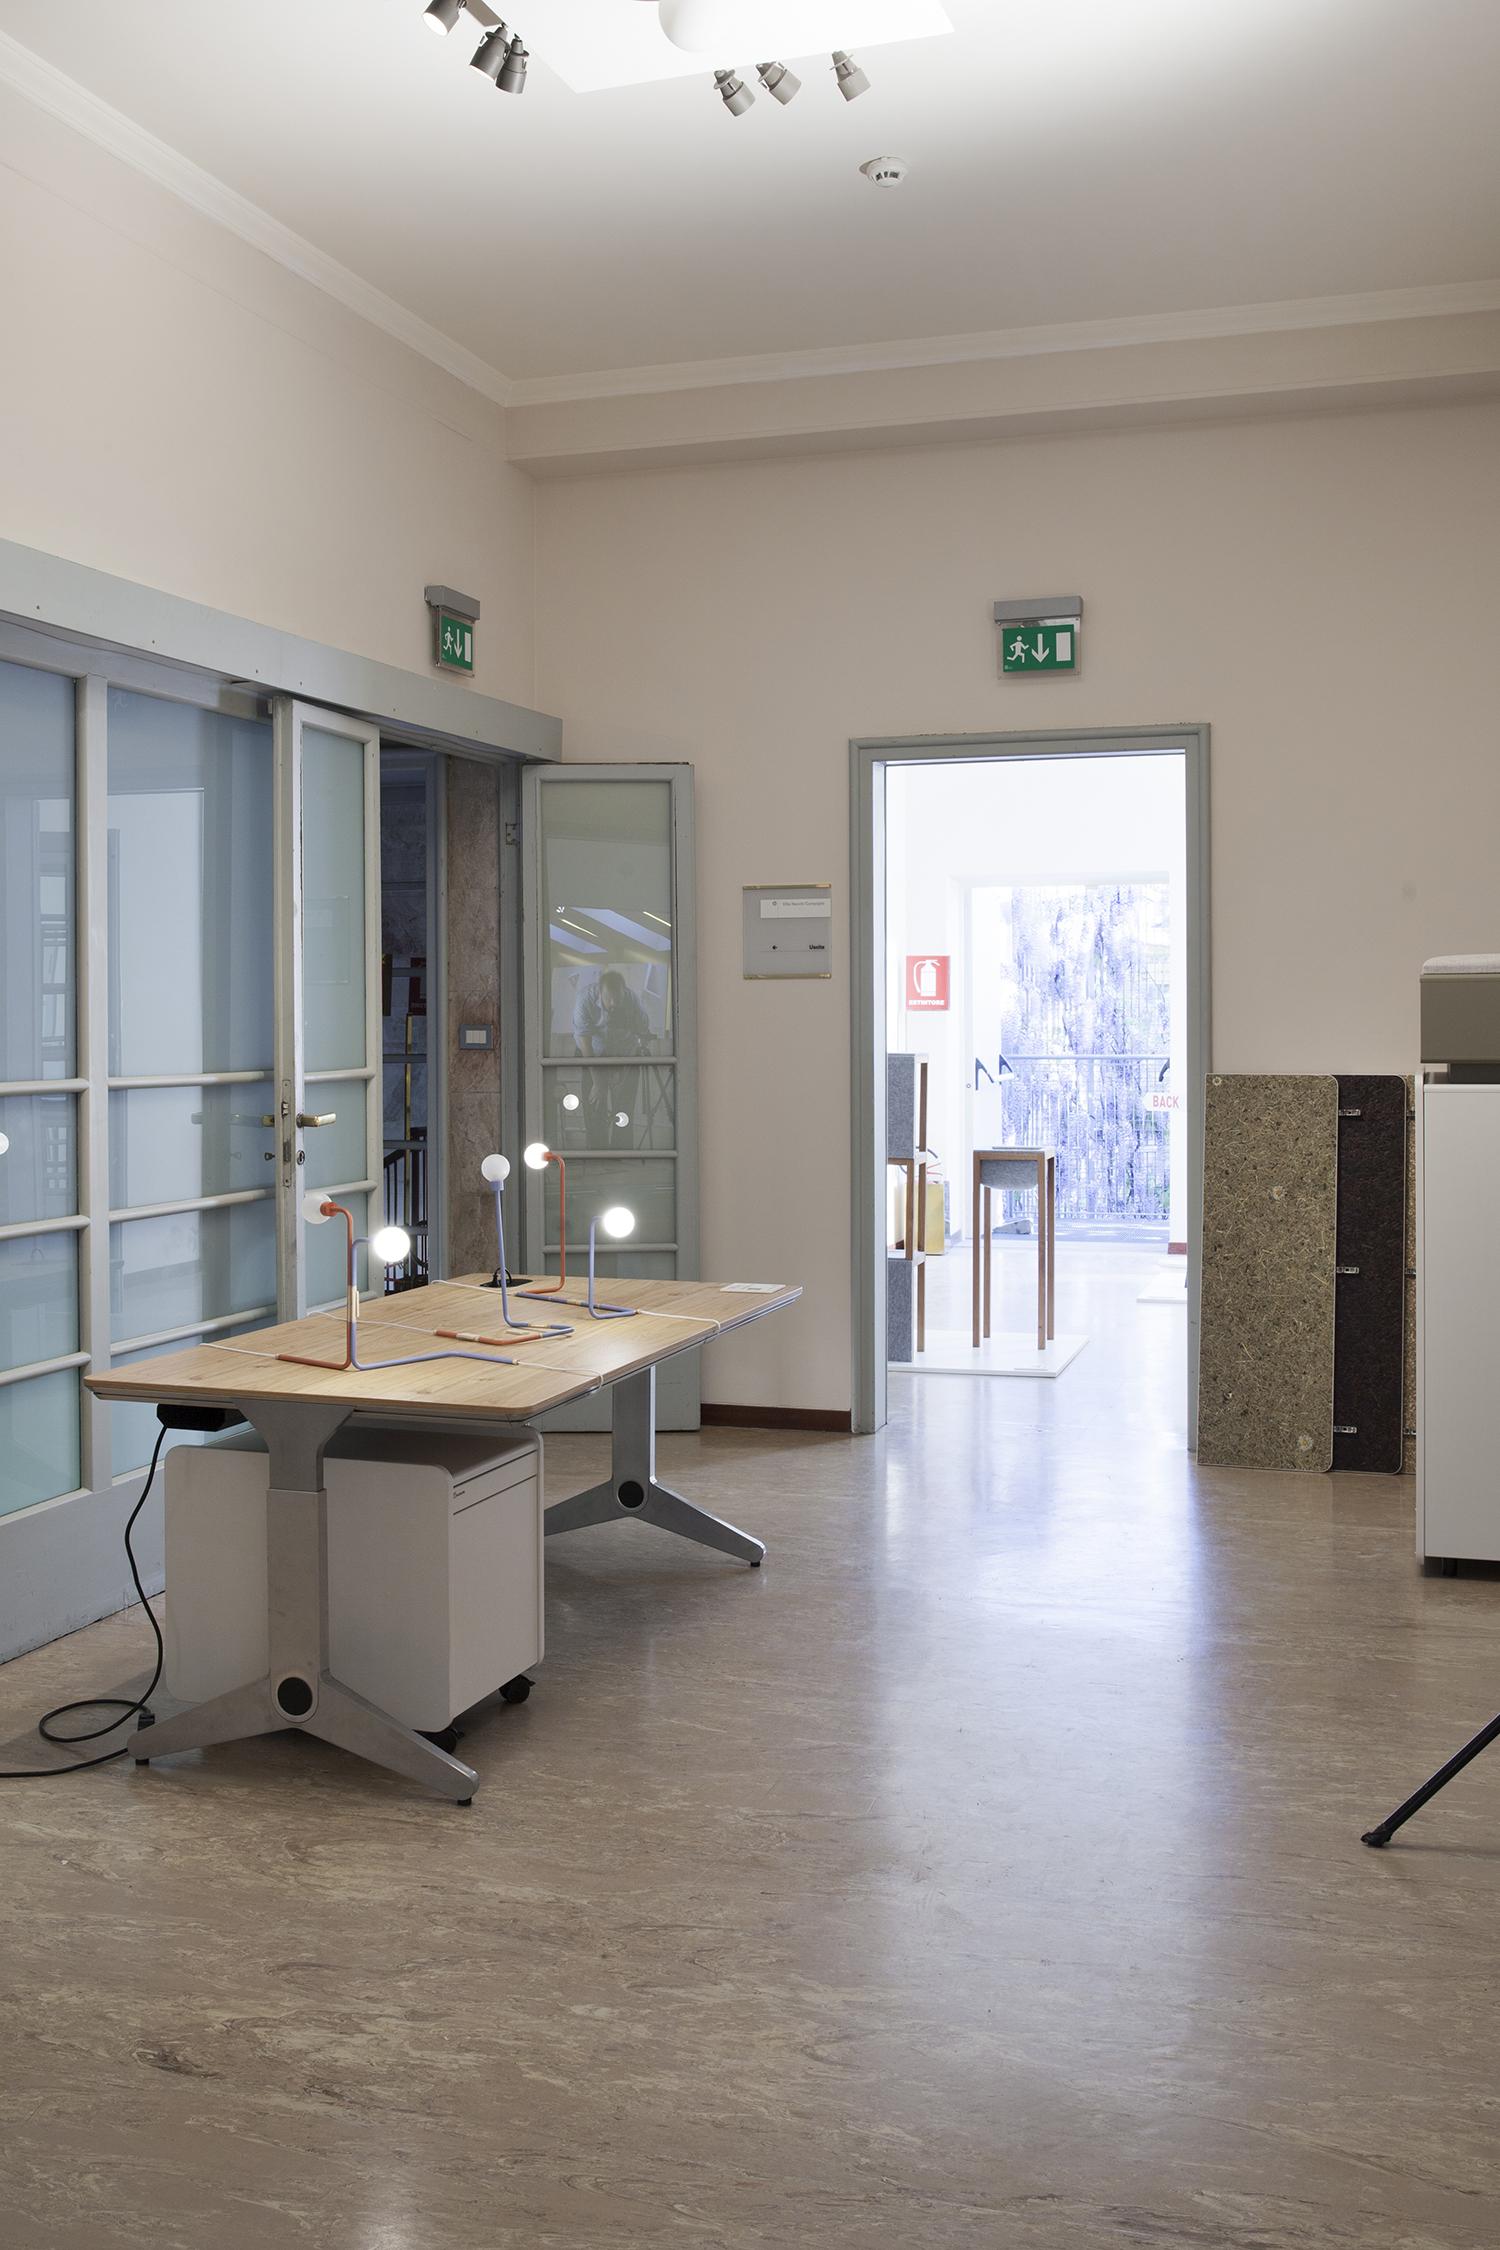 Maya Pindeus & Johanna Pichlbauer, Neudoerfler Office Systems Photography by Laura Fantacuzzi and Maxime Galati Fourcade